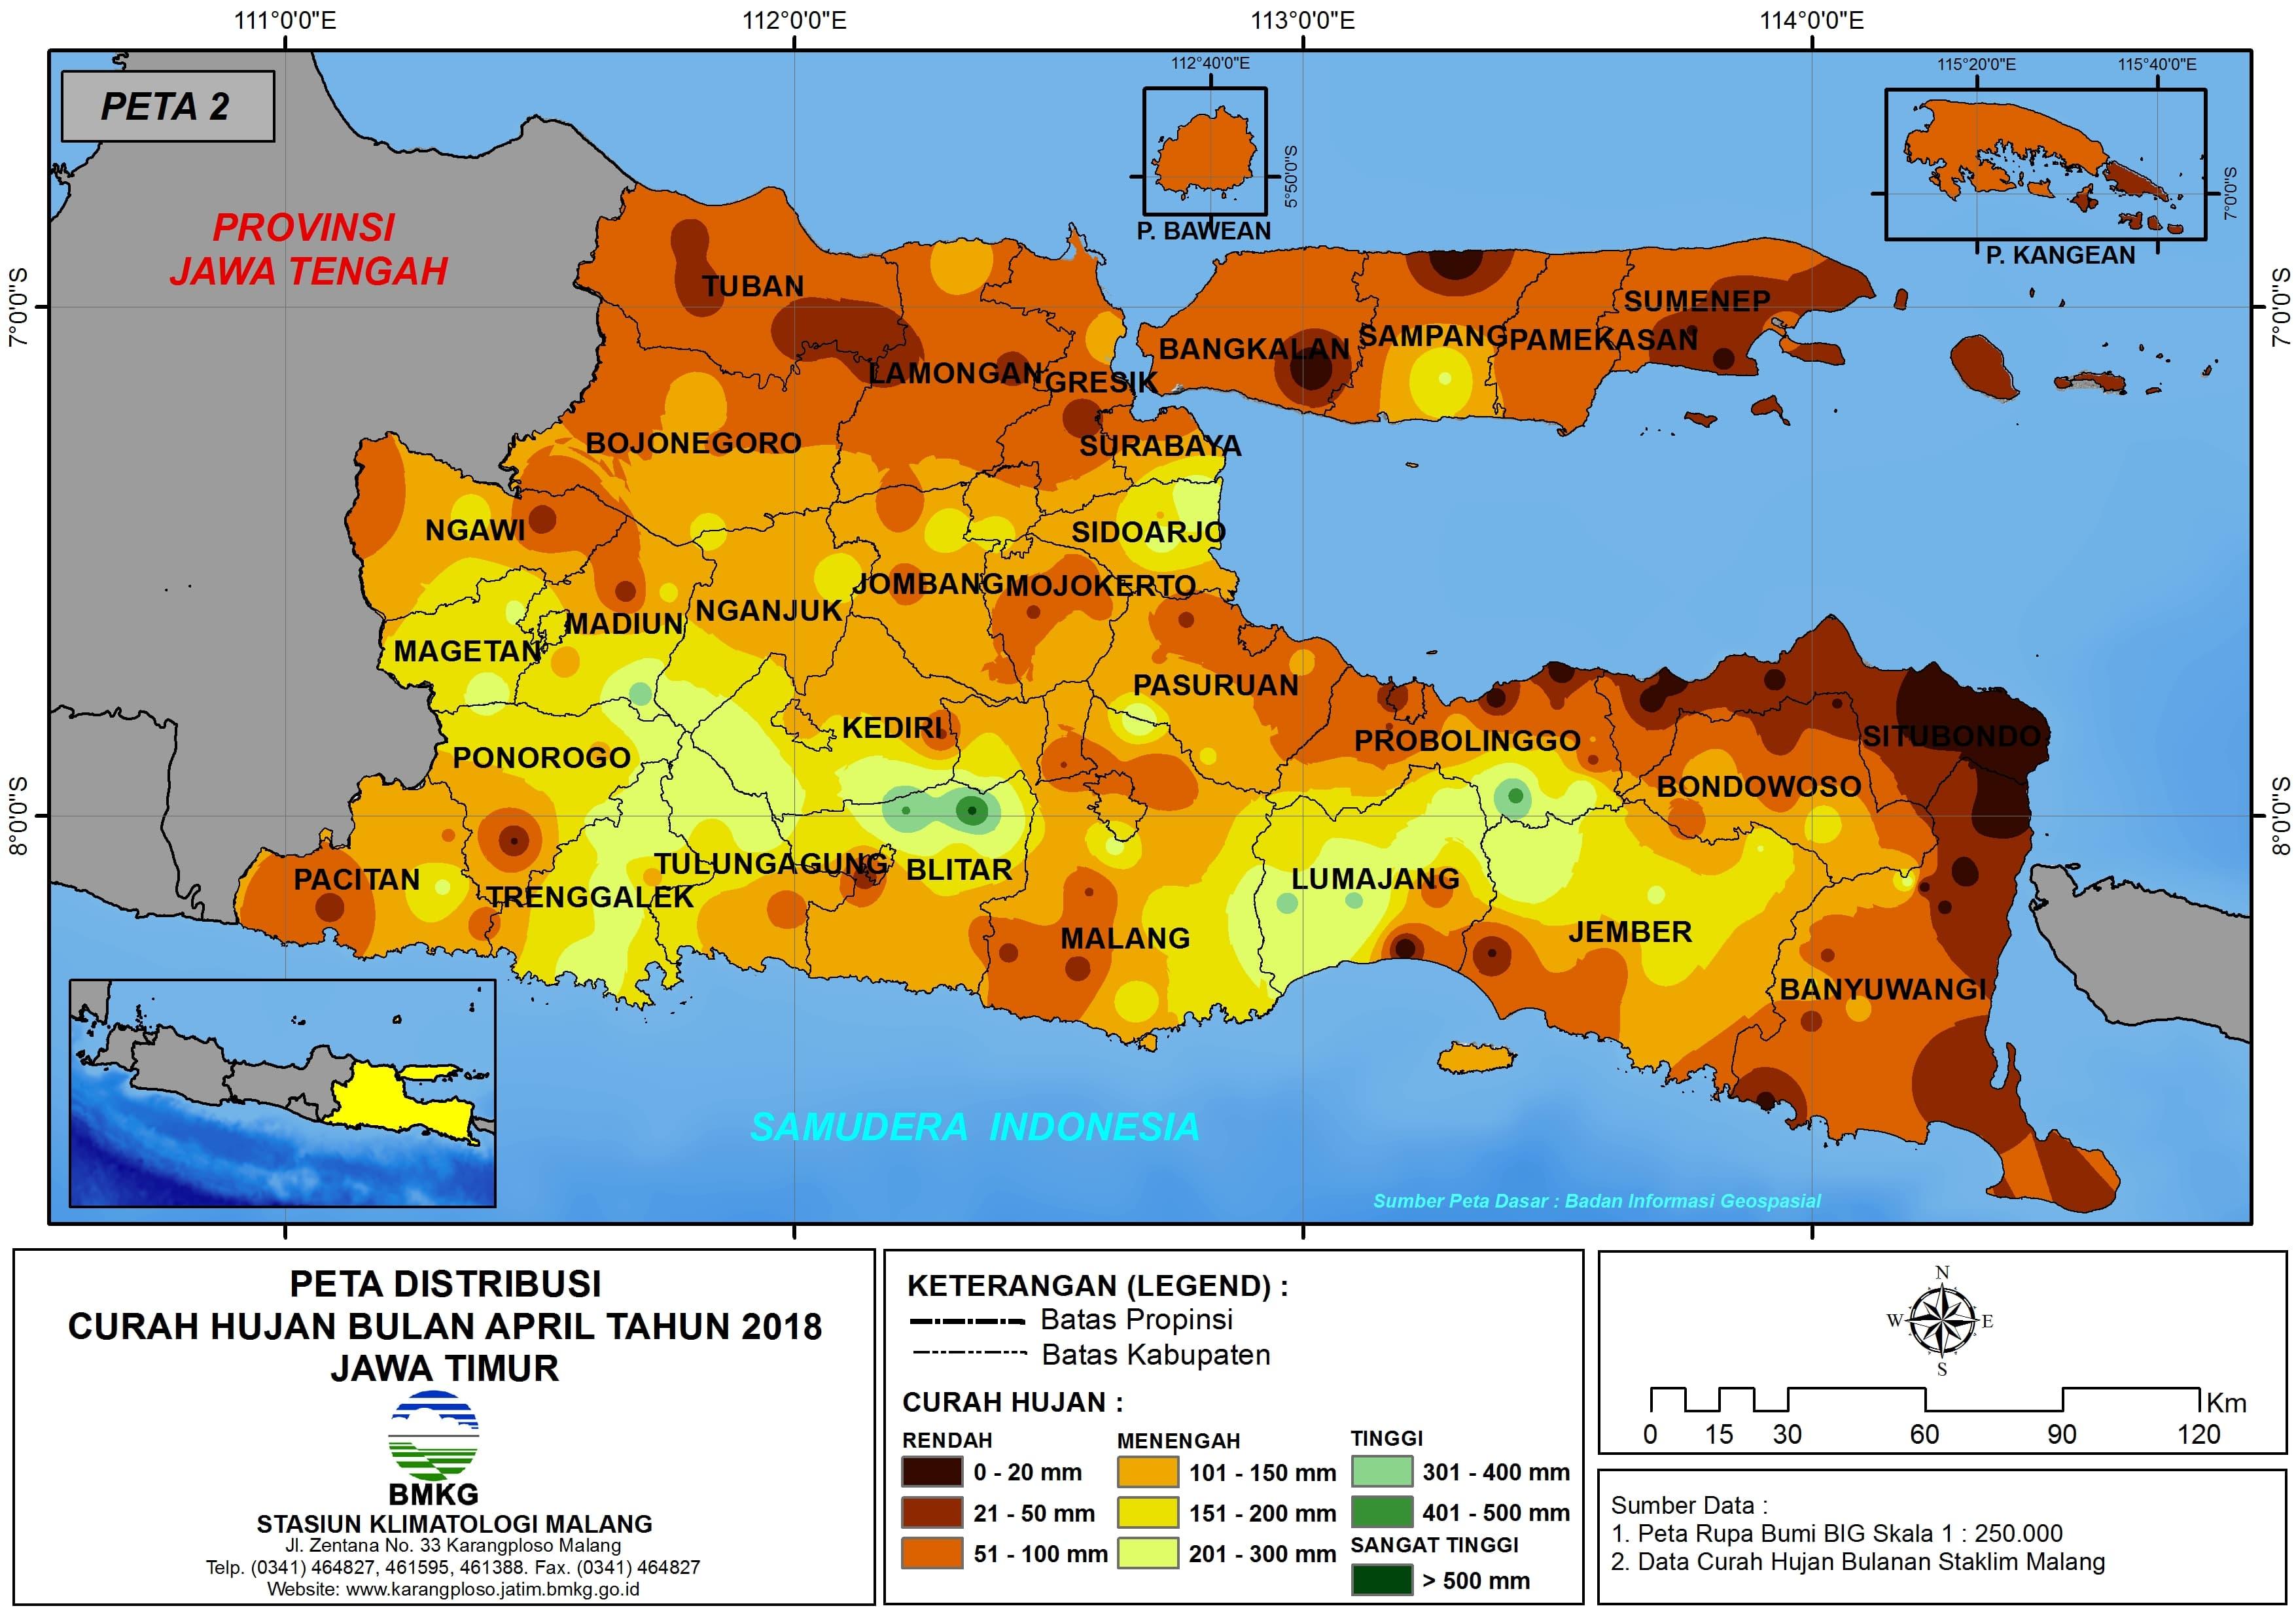 Analisis Distribusi Curah Hujan Bulan April Tahun 2018 di Propinsi Jawa Timur